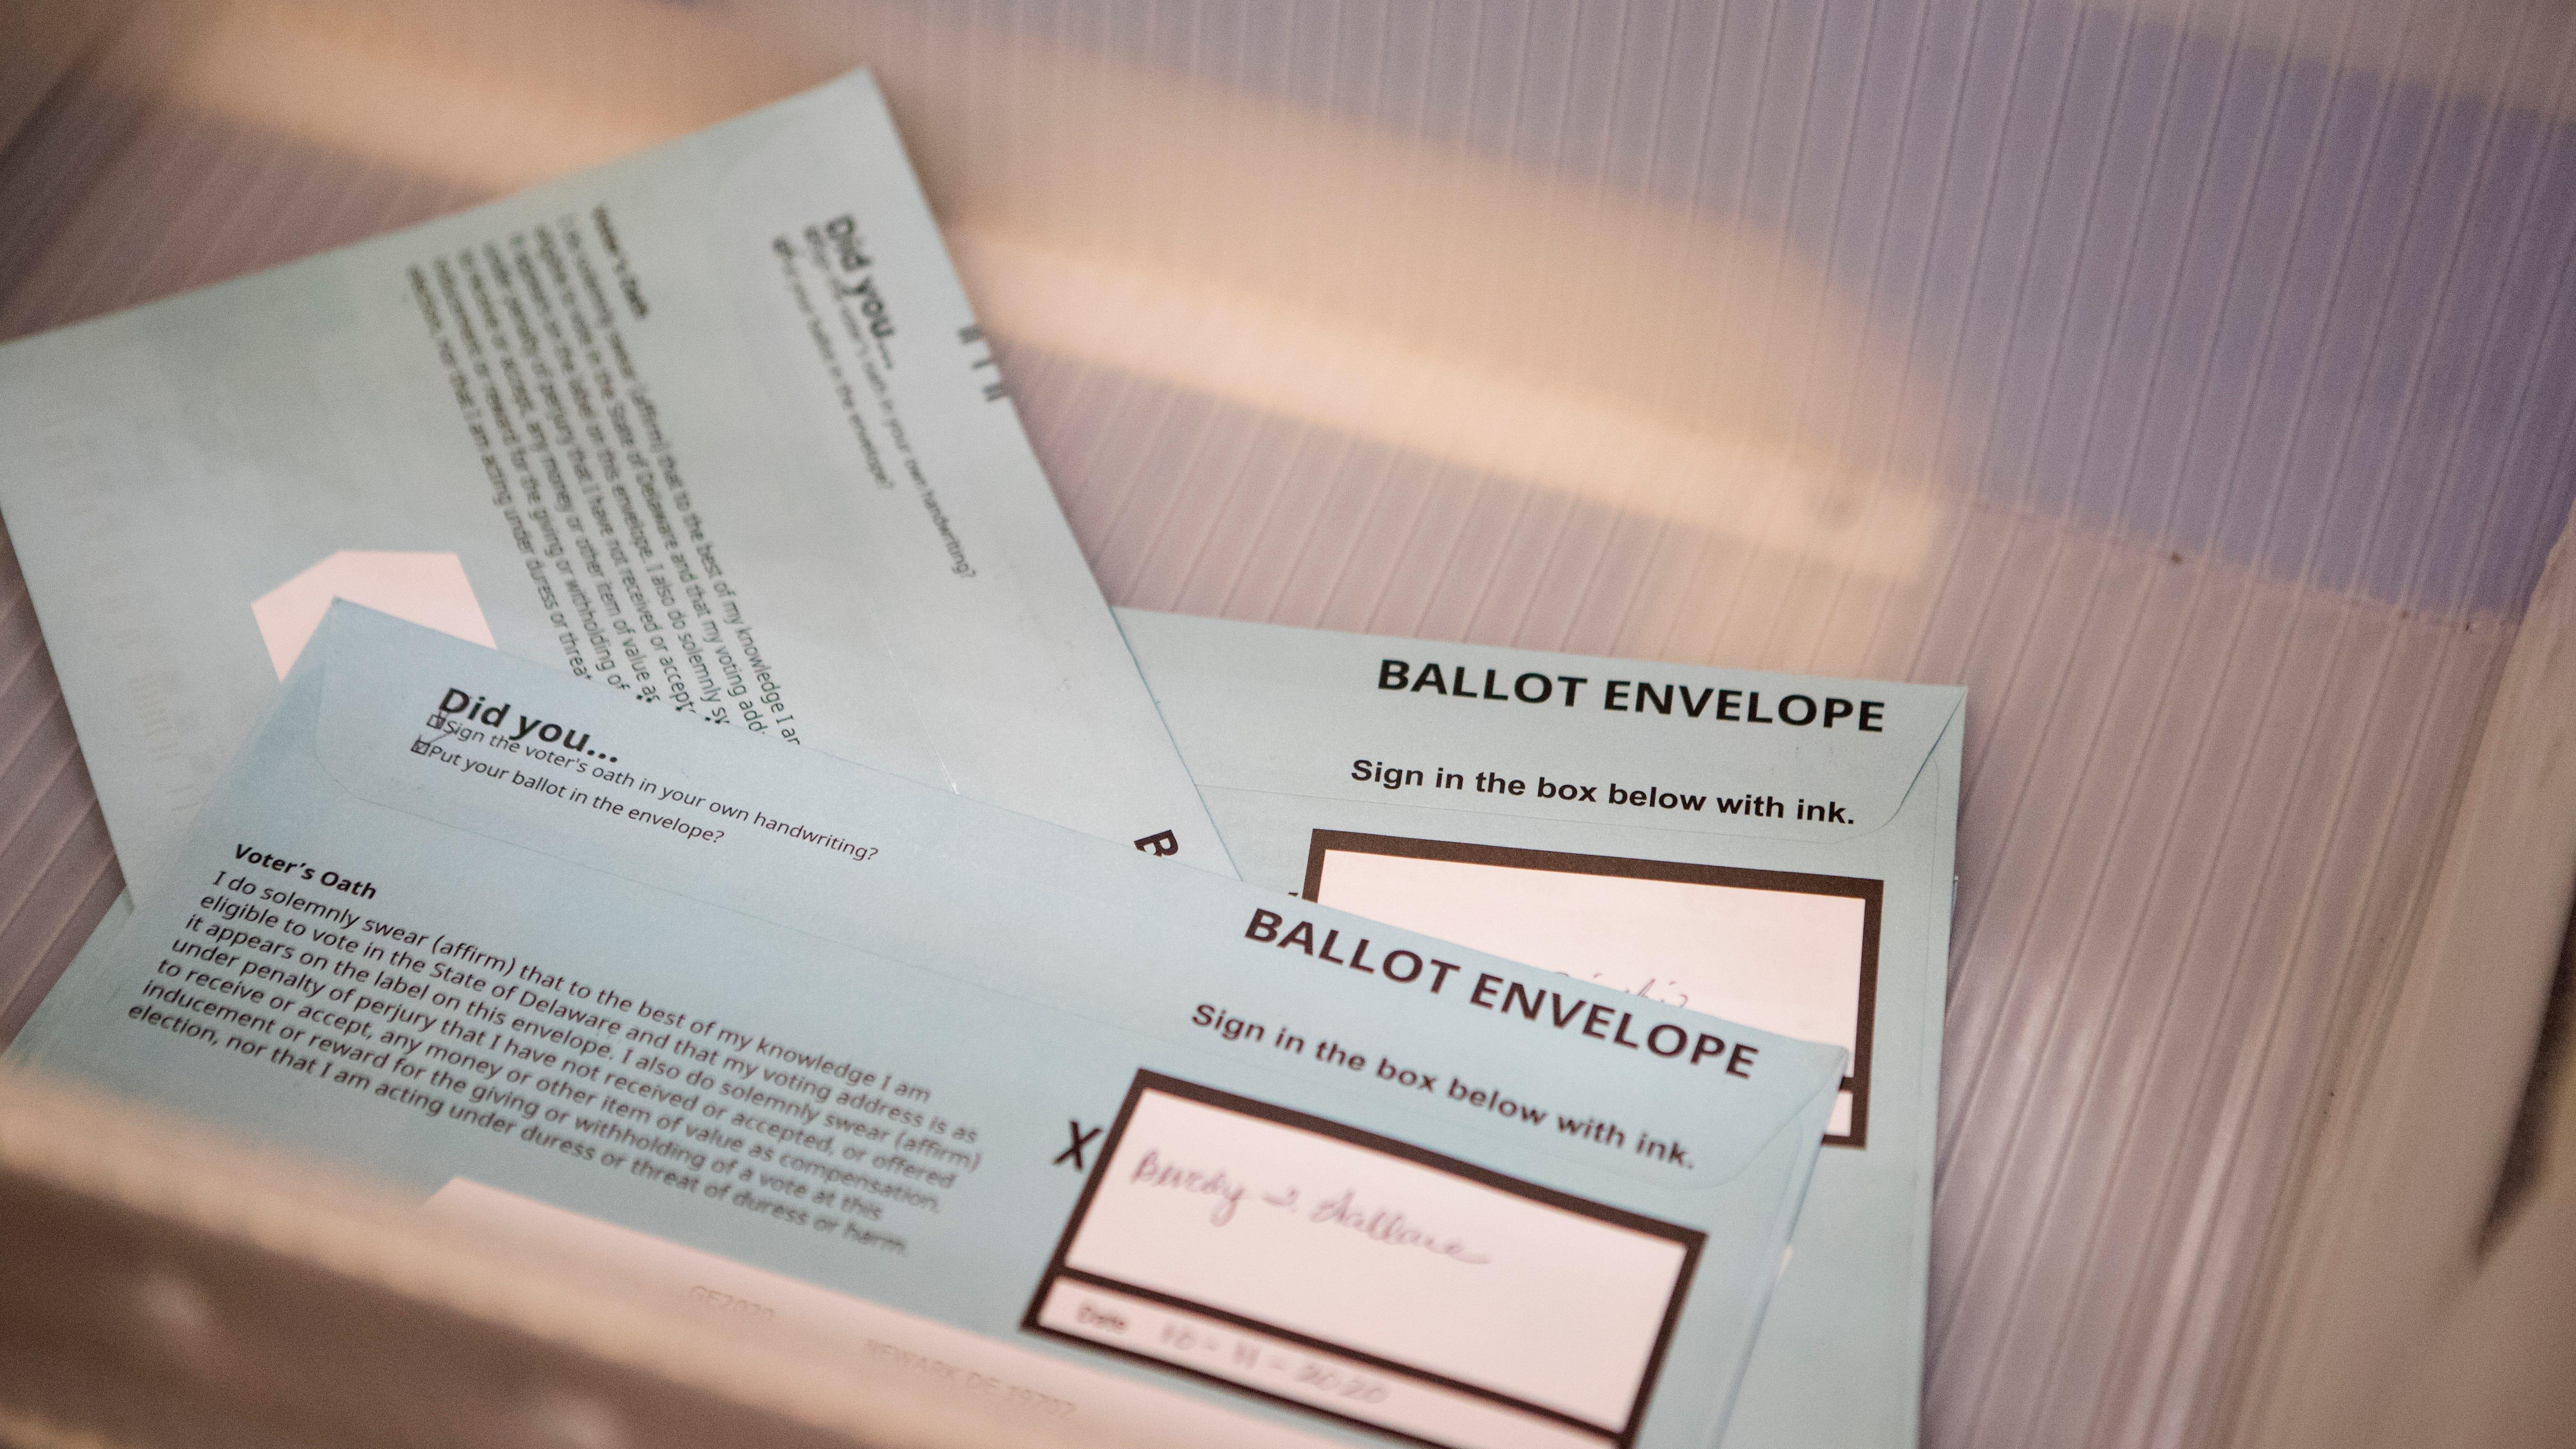 Republicans block bill to create no-excuse absentee voting in Delaware